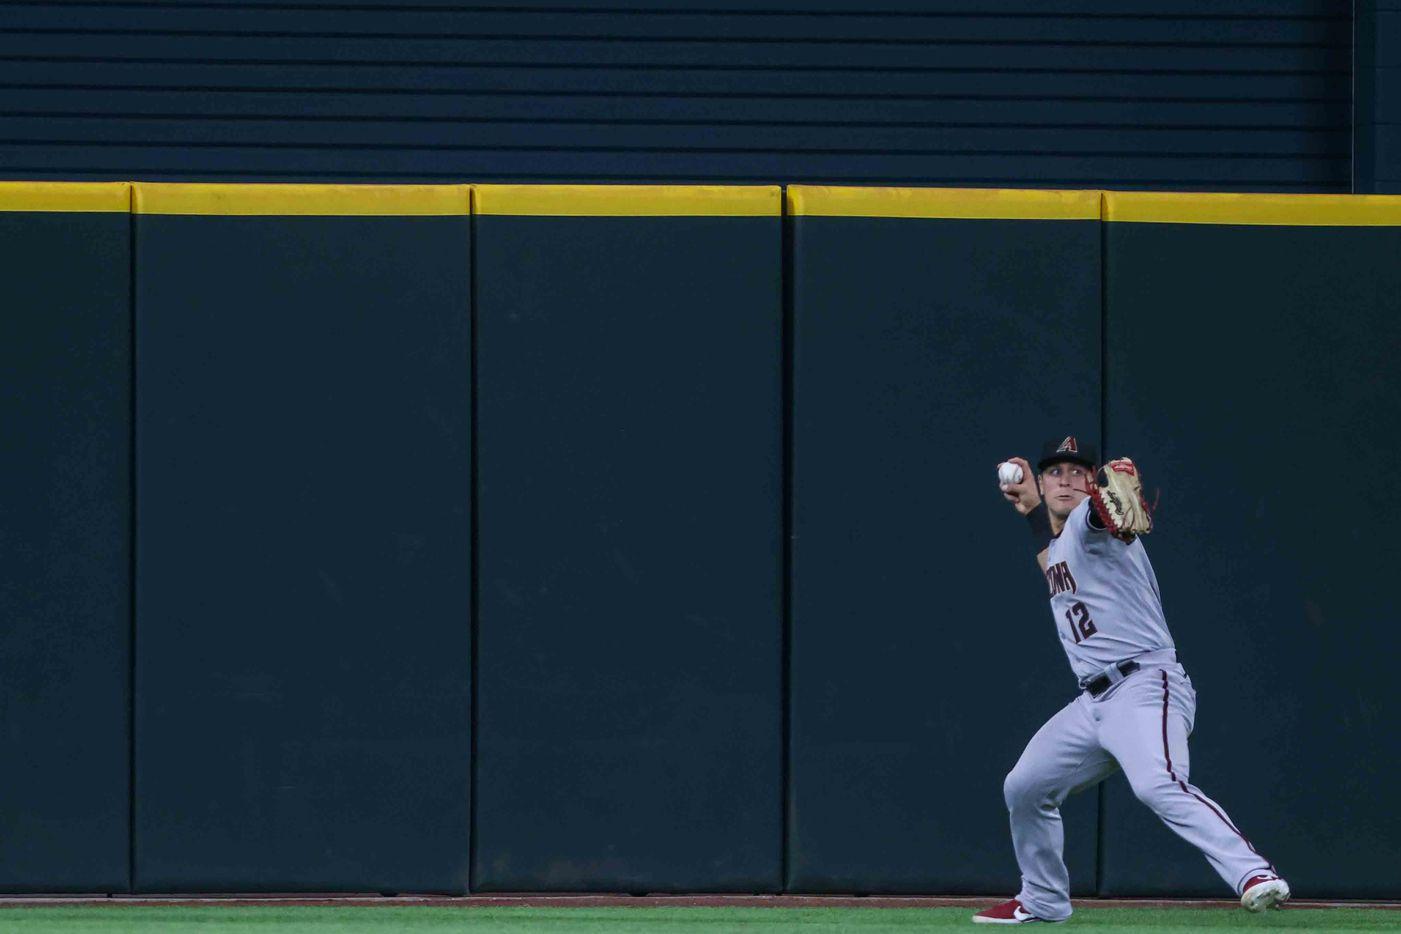 Daulton Varsho (12) catches a fly during Arizona Diamondbacks at Texas Rangers game at the Globe Life Field in Arlington, Texas on Wednesday, July 28, 2021. (Lola Gomez/The Dallas Morning News)